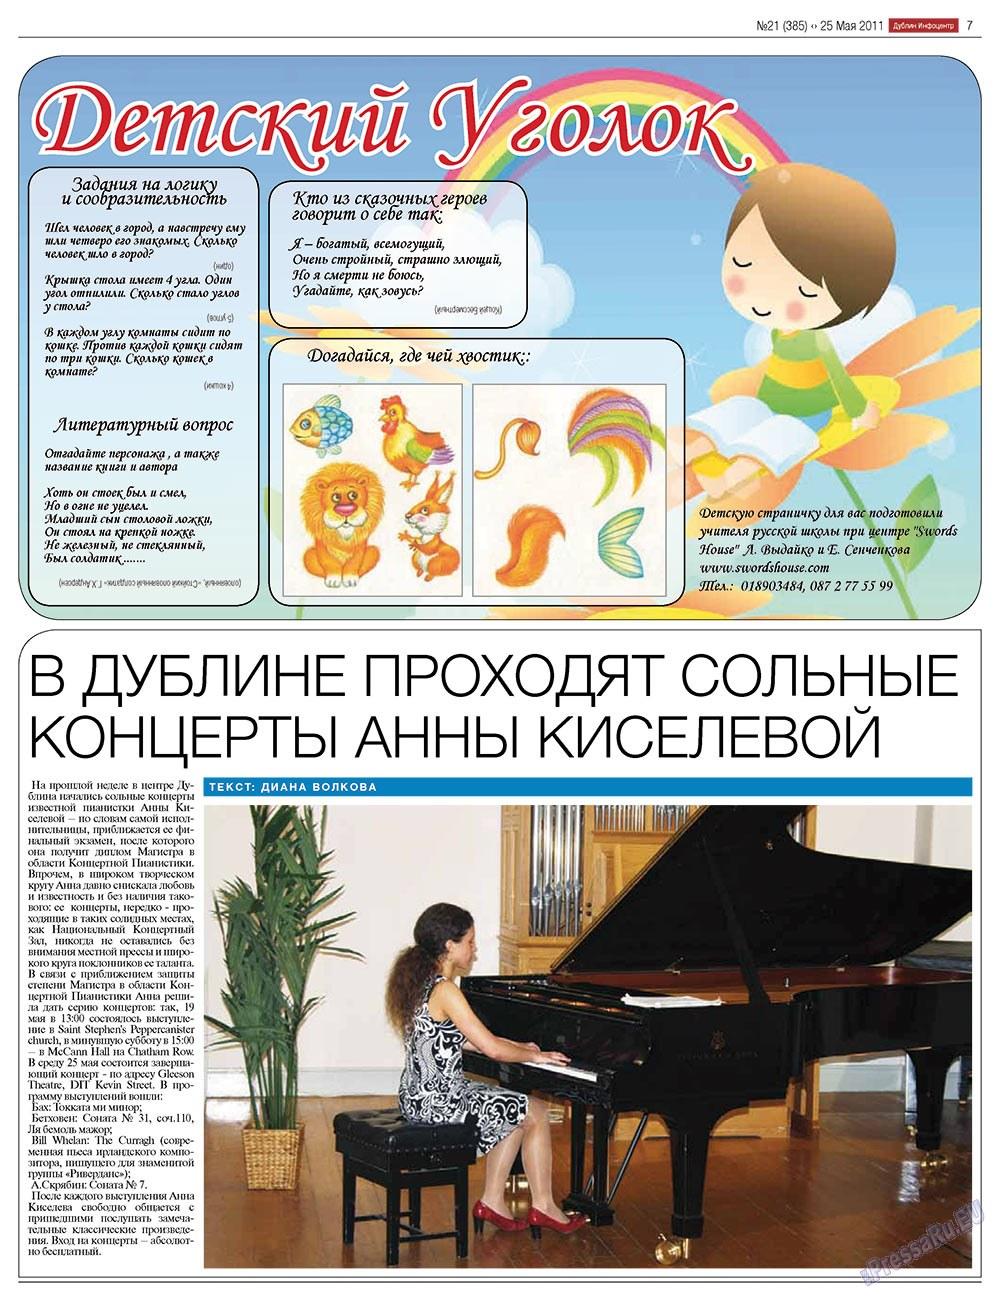 Дублин инфоцентр (газета). 2011 год, номер 21, стр. 7